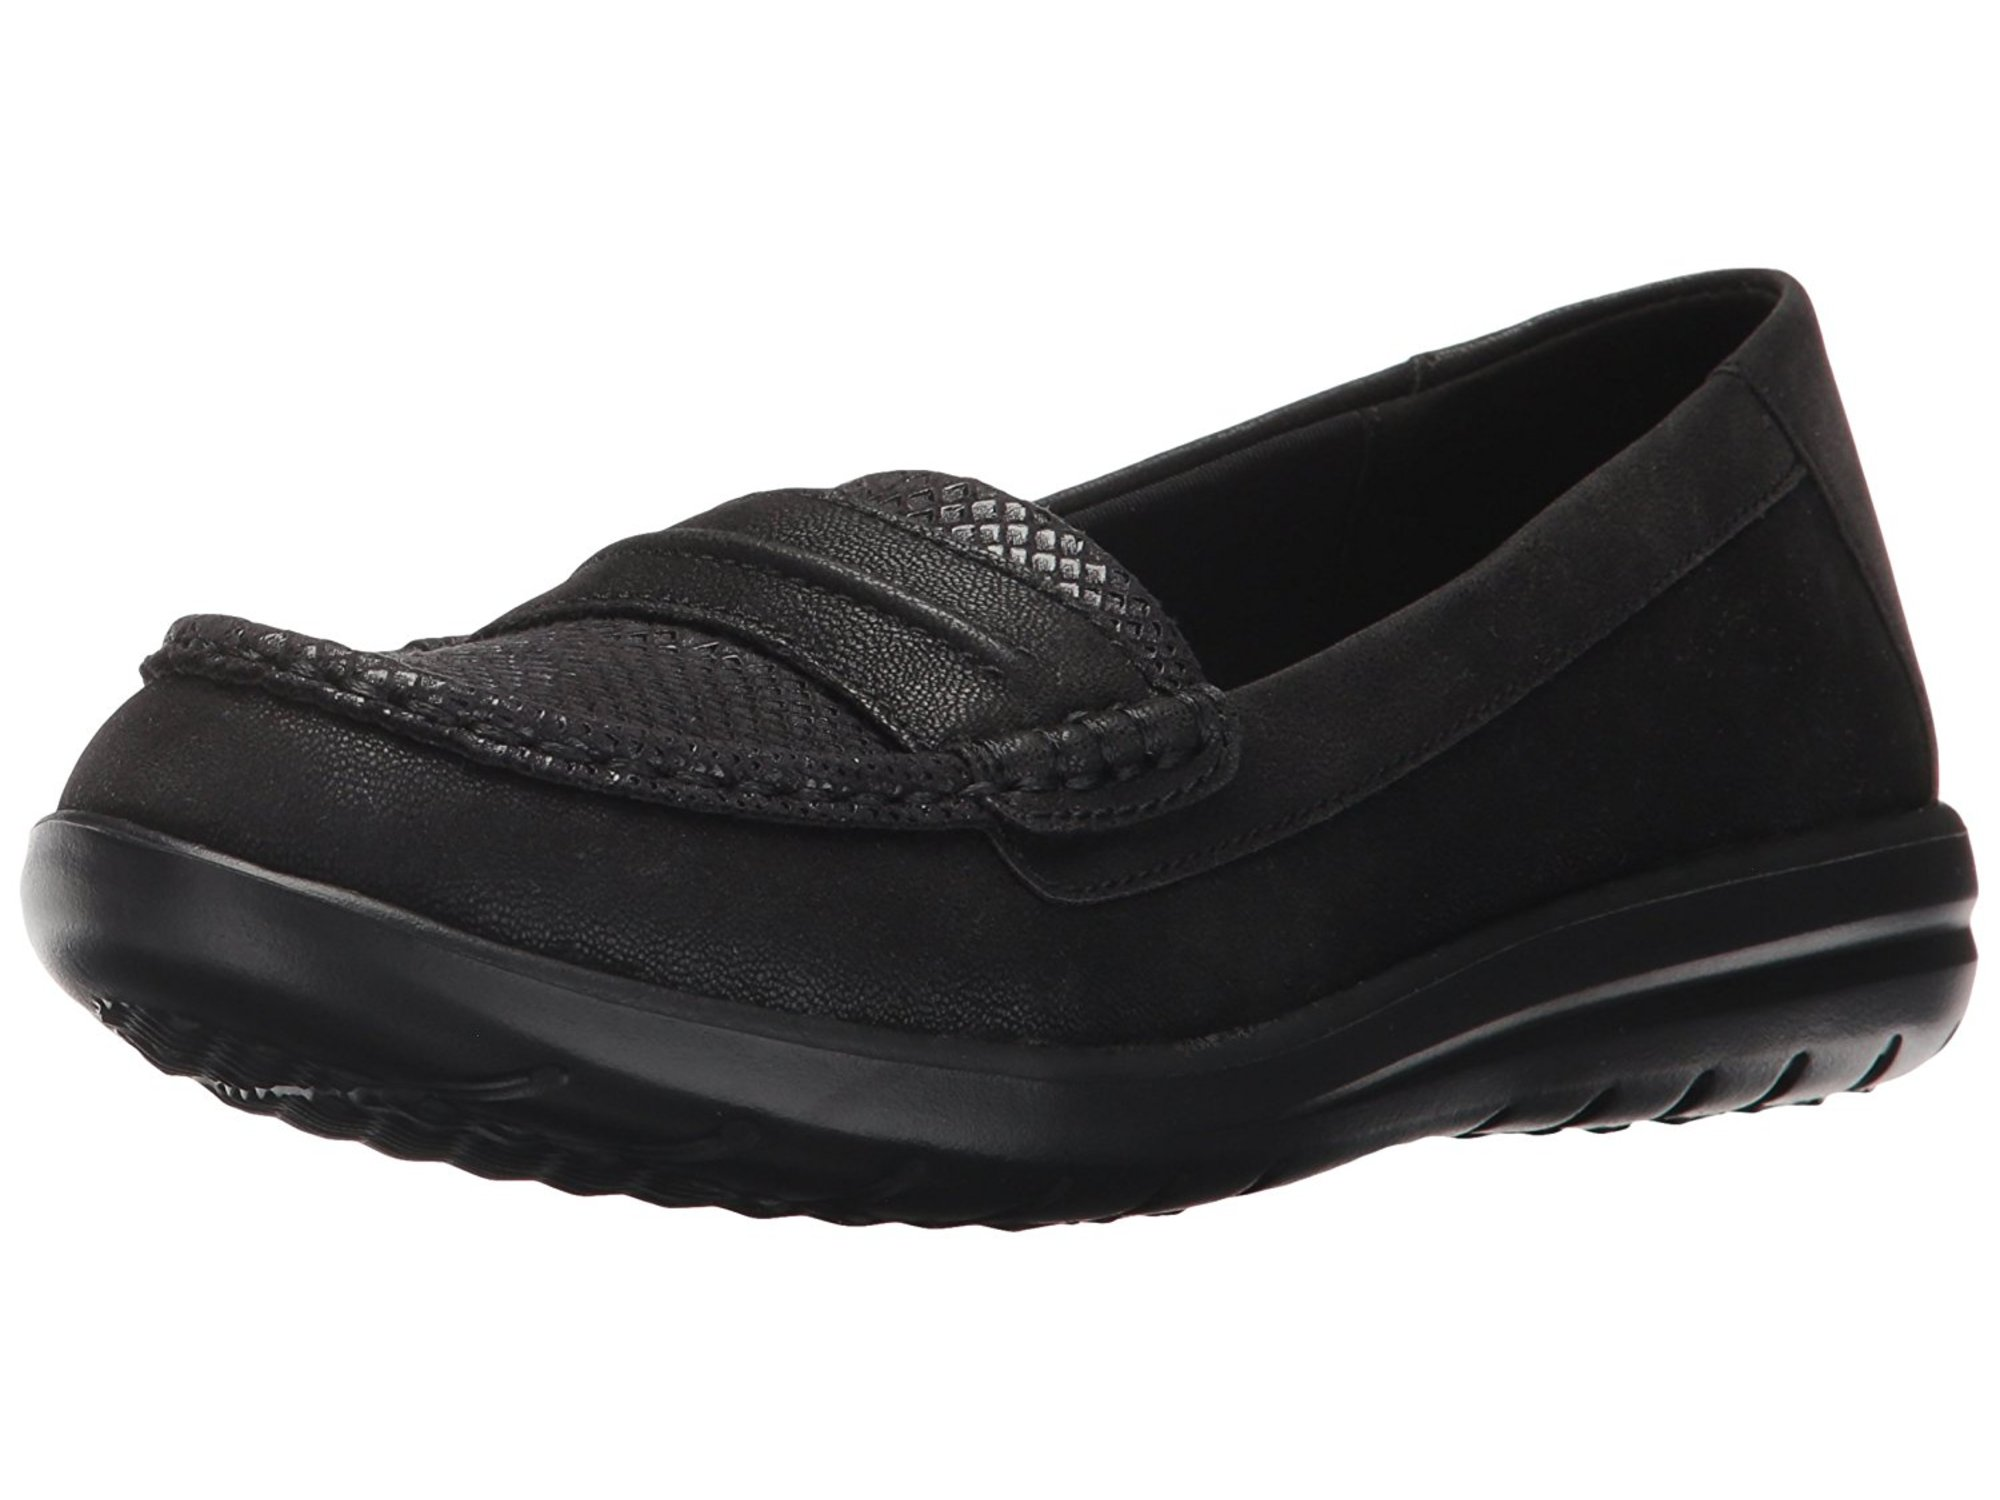 34a6ea3139b CLARKS Womens Jocolin Maye Fabric Closed Toe Loafers